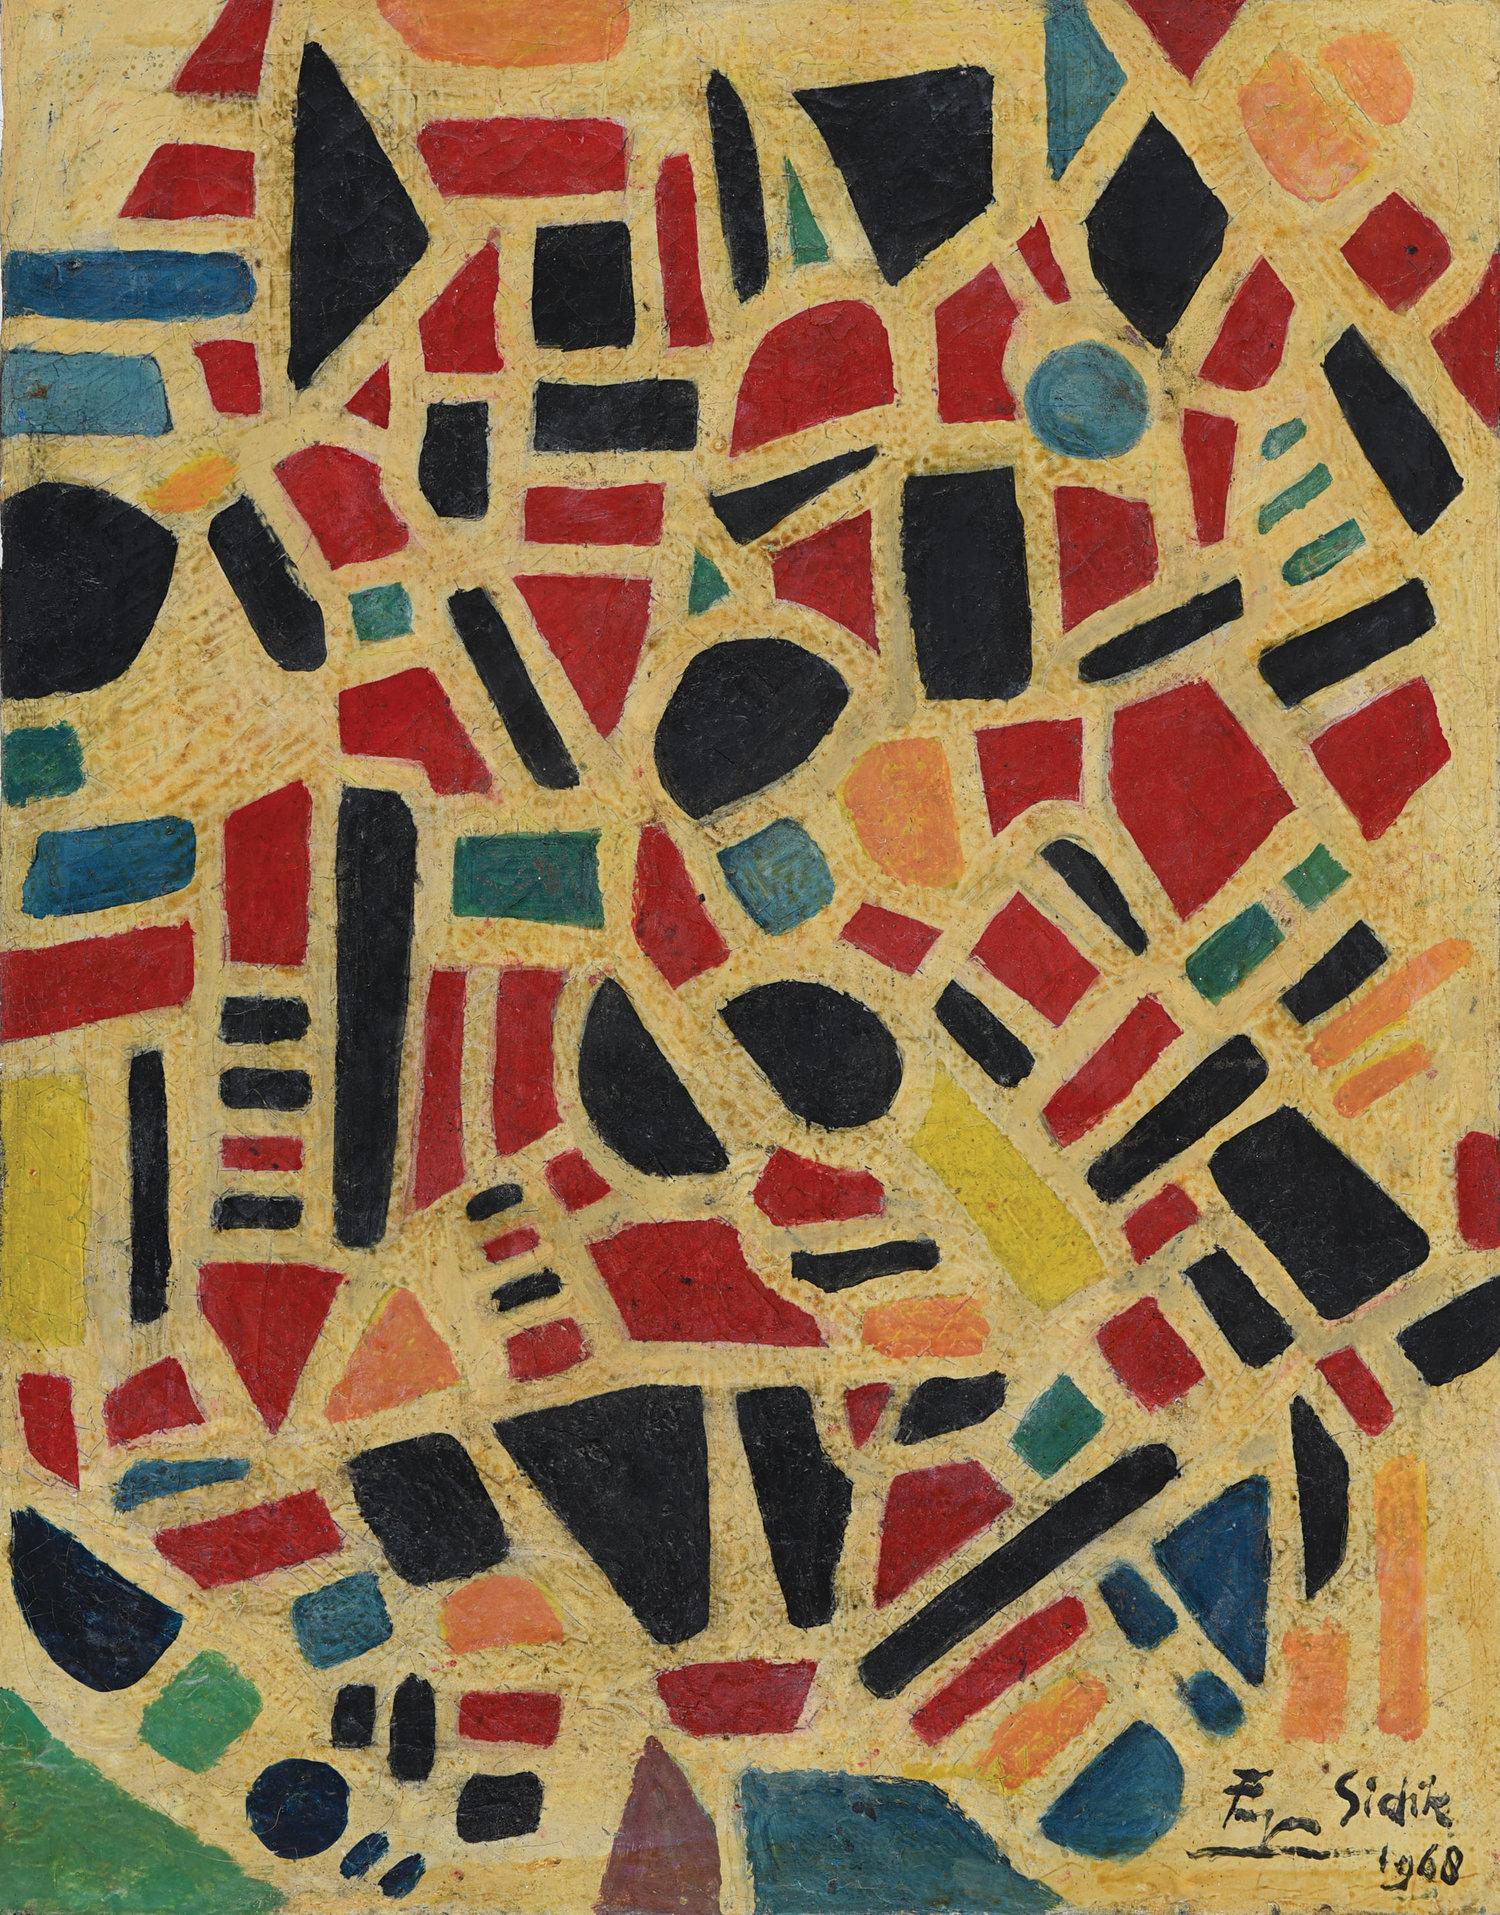 Fadjar Sidik, Untitled, oil on canvas, 70 x 55 cm, 1968